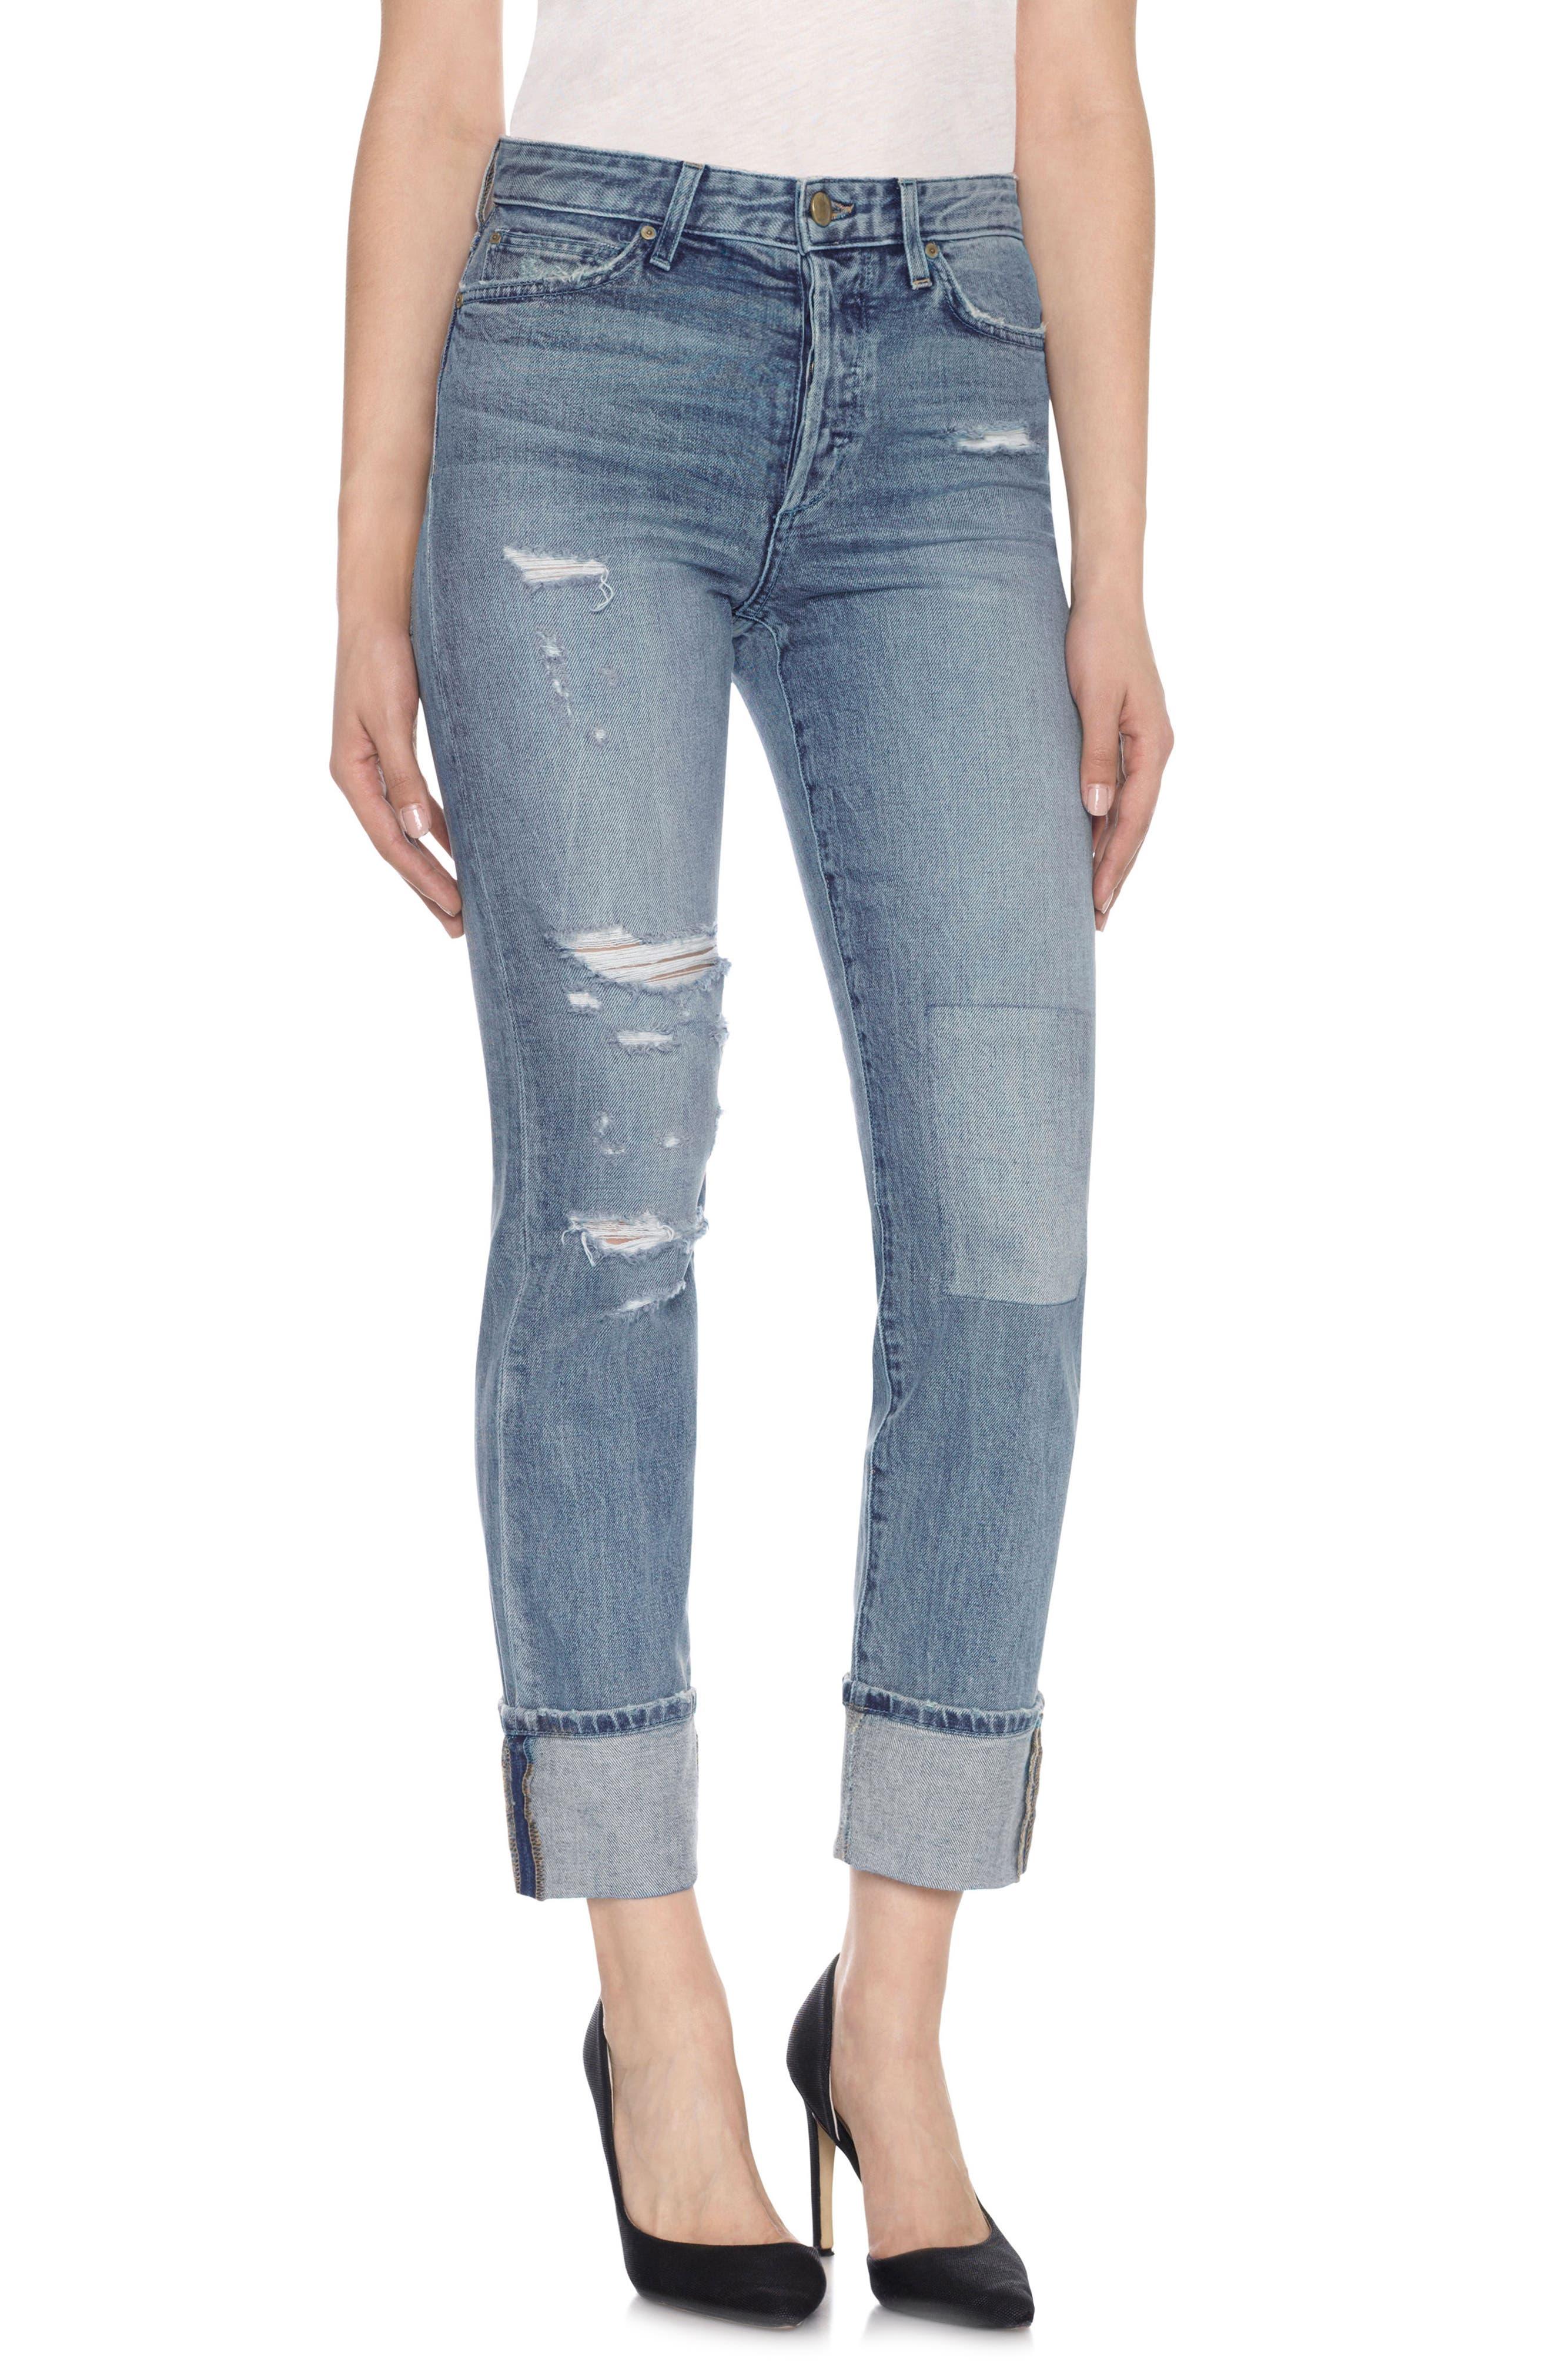 Taylor Hill x Joe's Debbie Cuff Straight Leg Jeans (Jaylee)